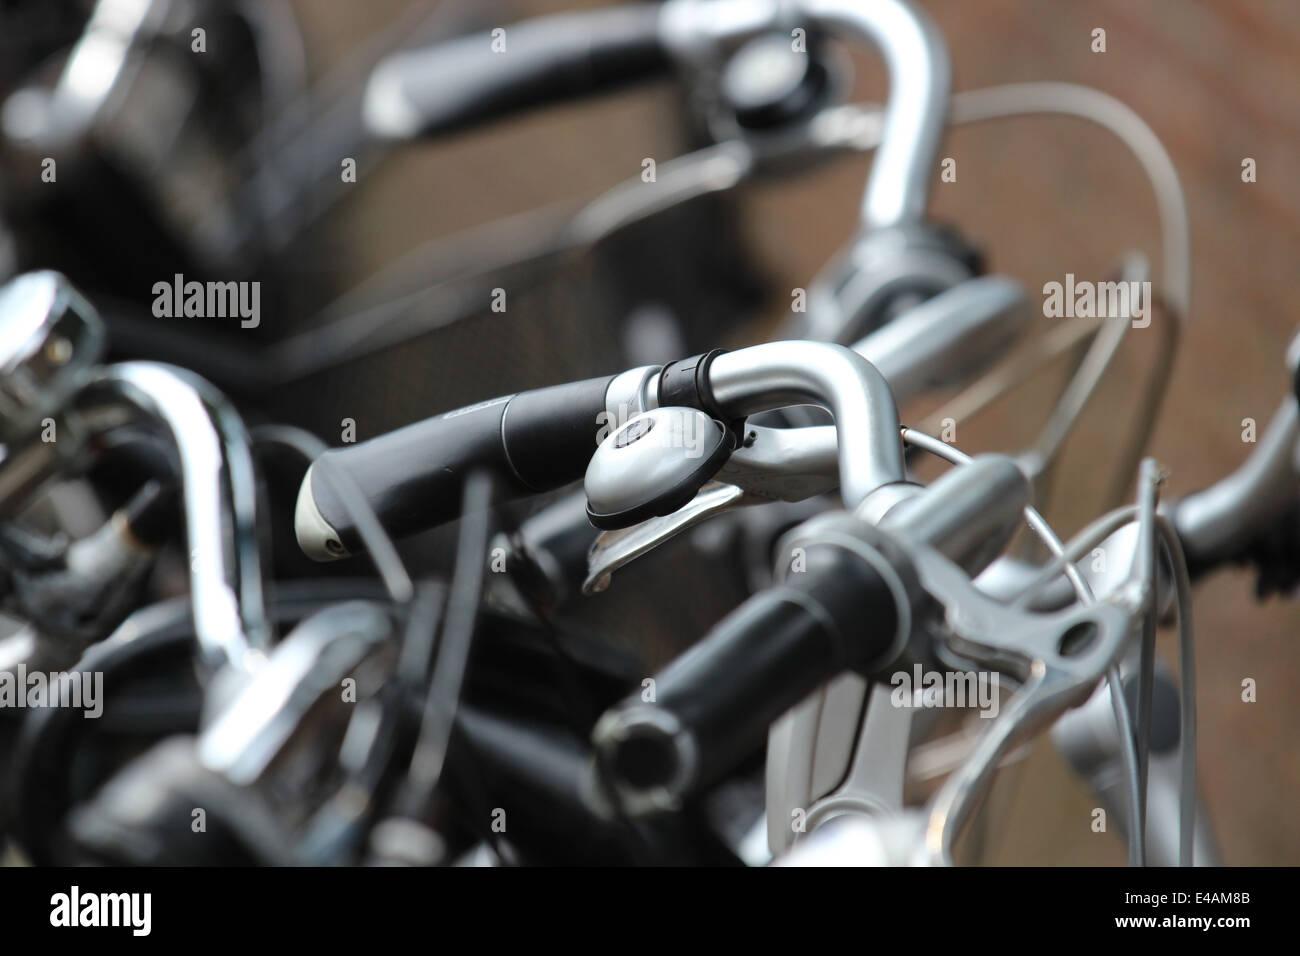 Close up of bike handlebars and bell Stock Photo